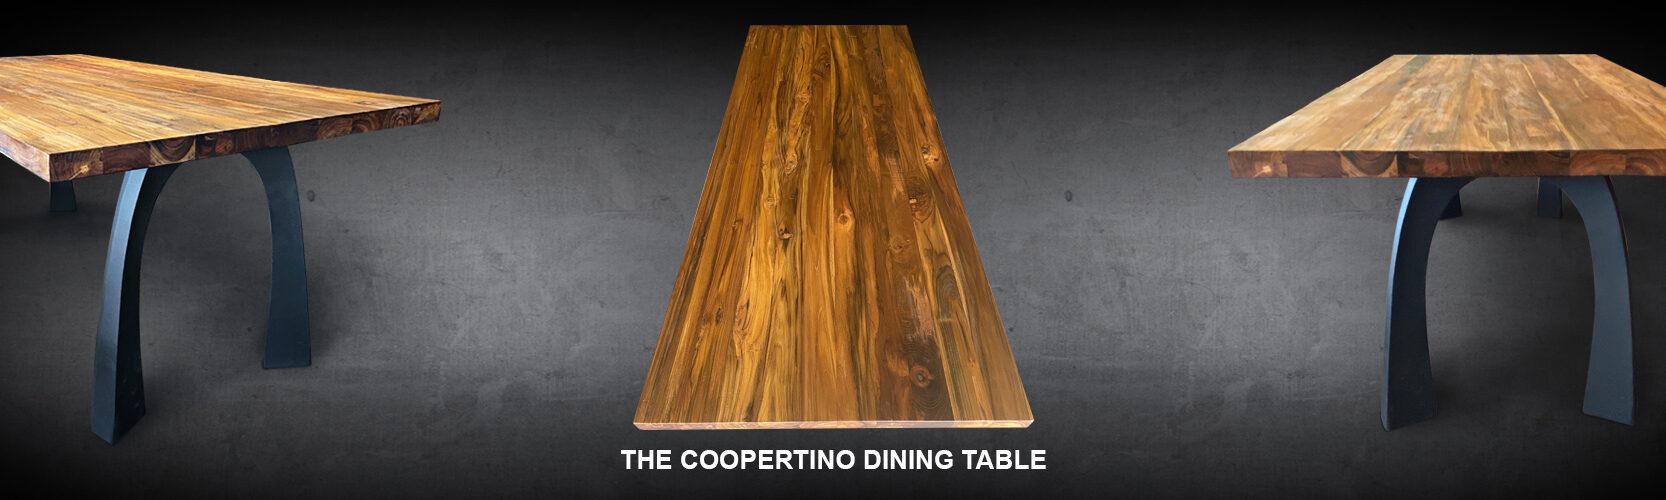 Coopertino Dining Table Reclaimed Teak Wood Modern Wishbone Iron Base